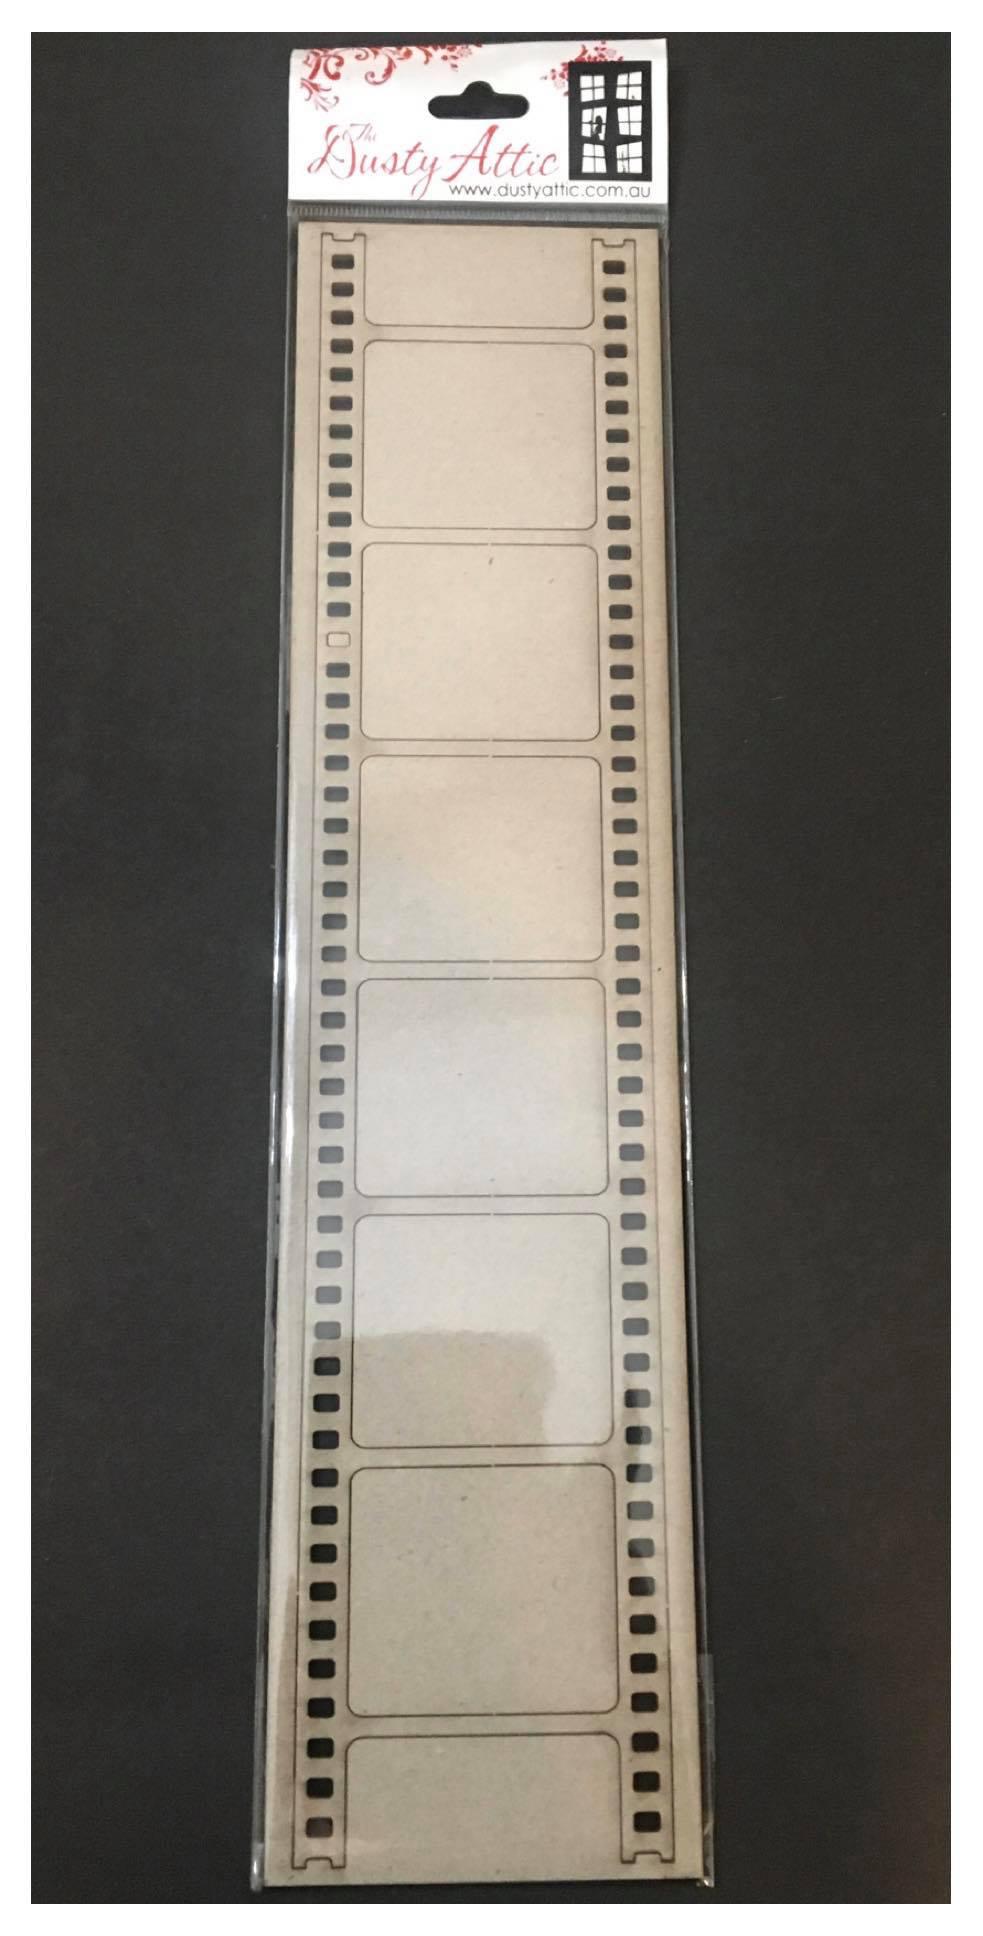 Dusty Attic Chipboard - Photo Strip